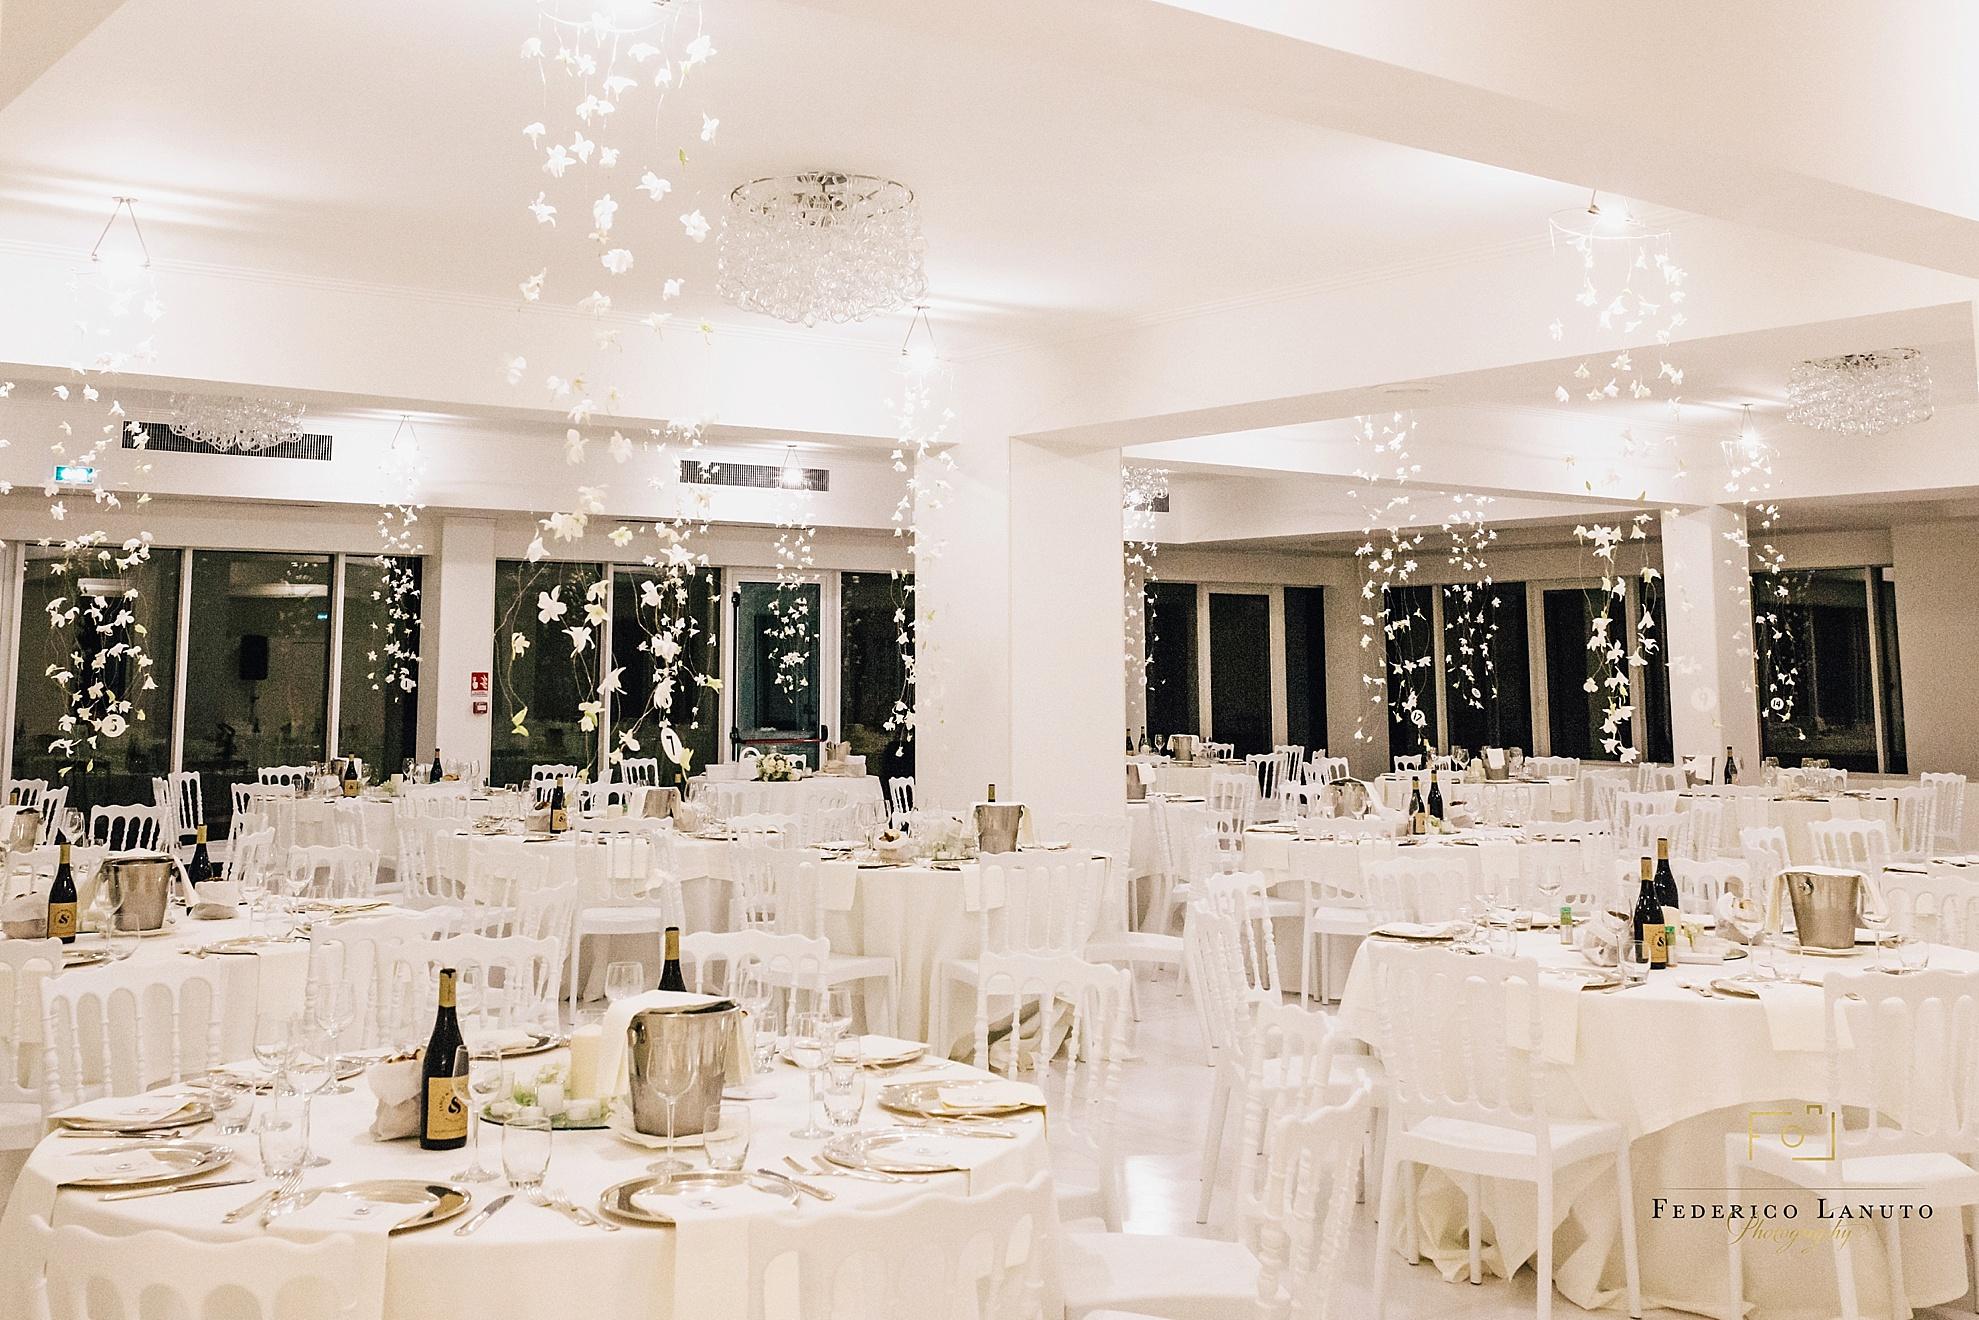 chiave-trabocchi-location-wedding-planner-g-eventi